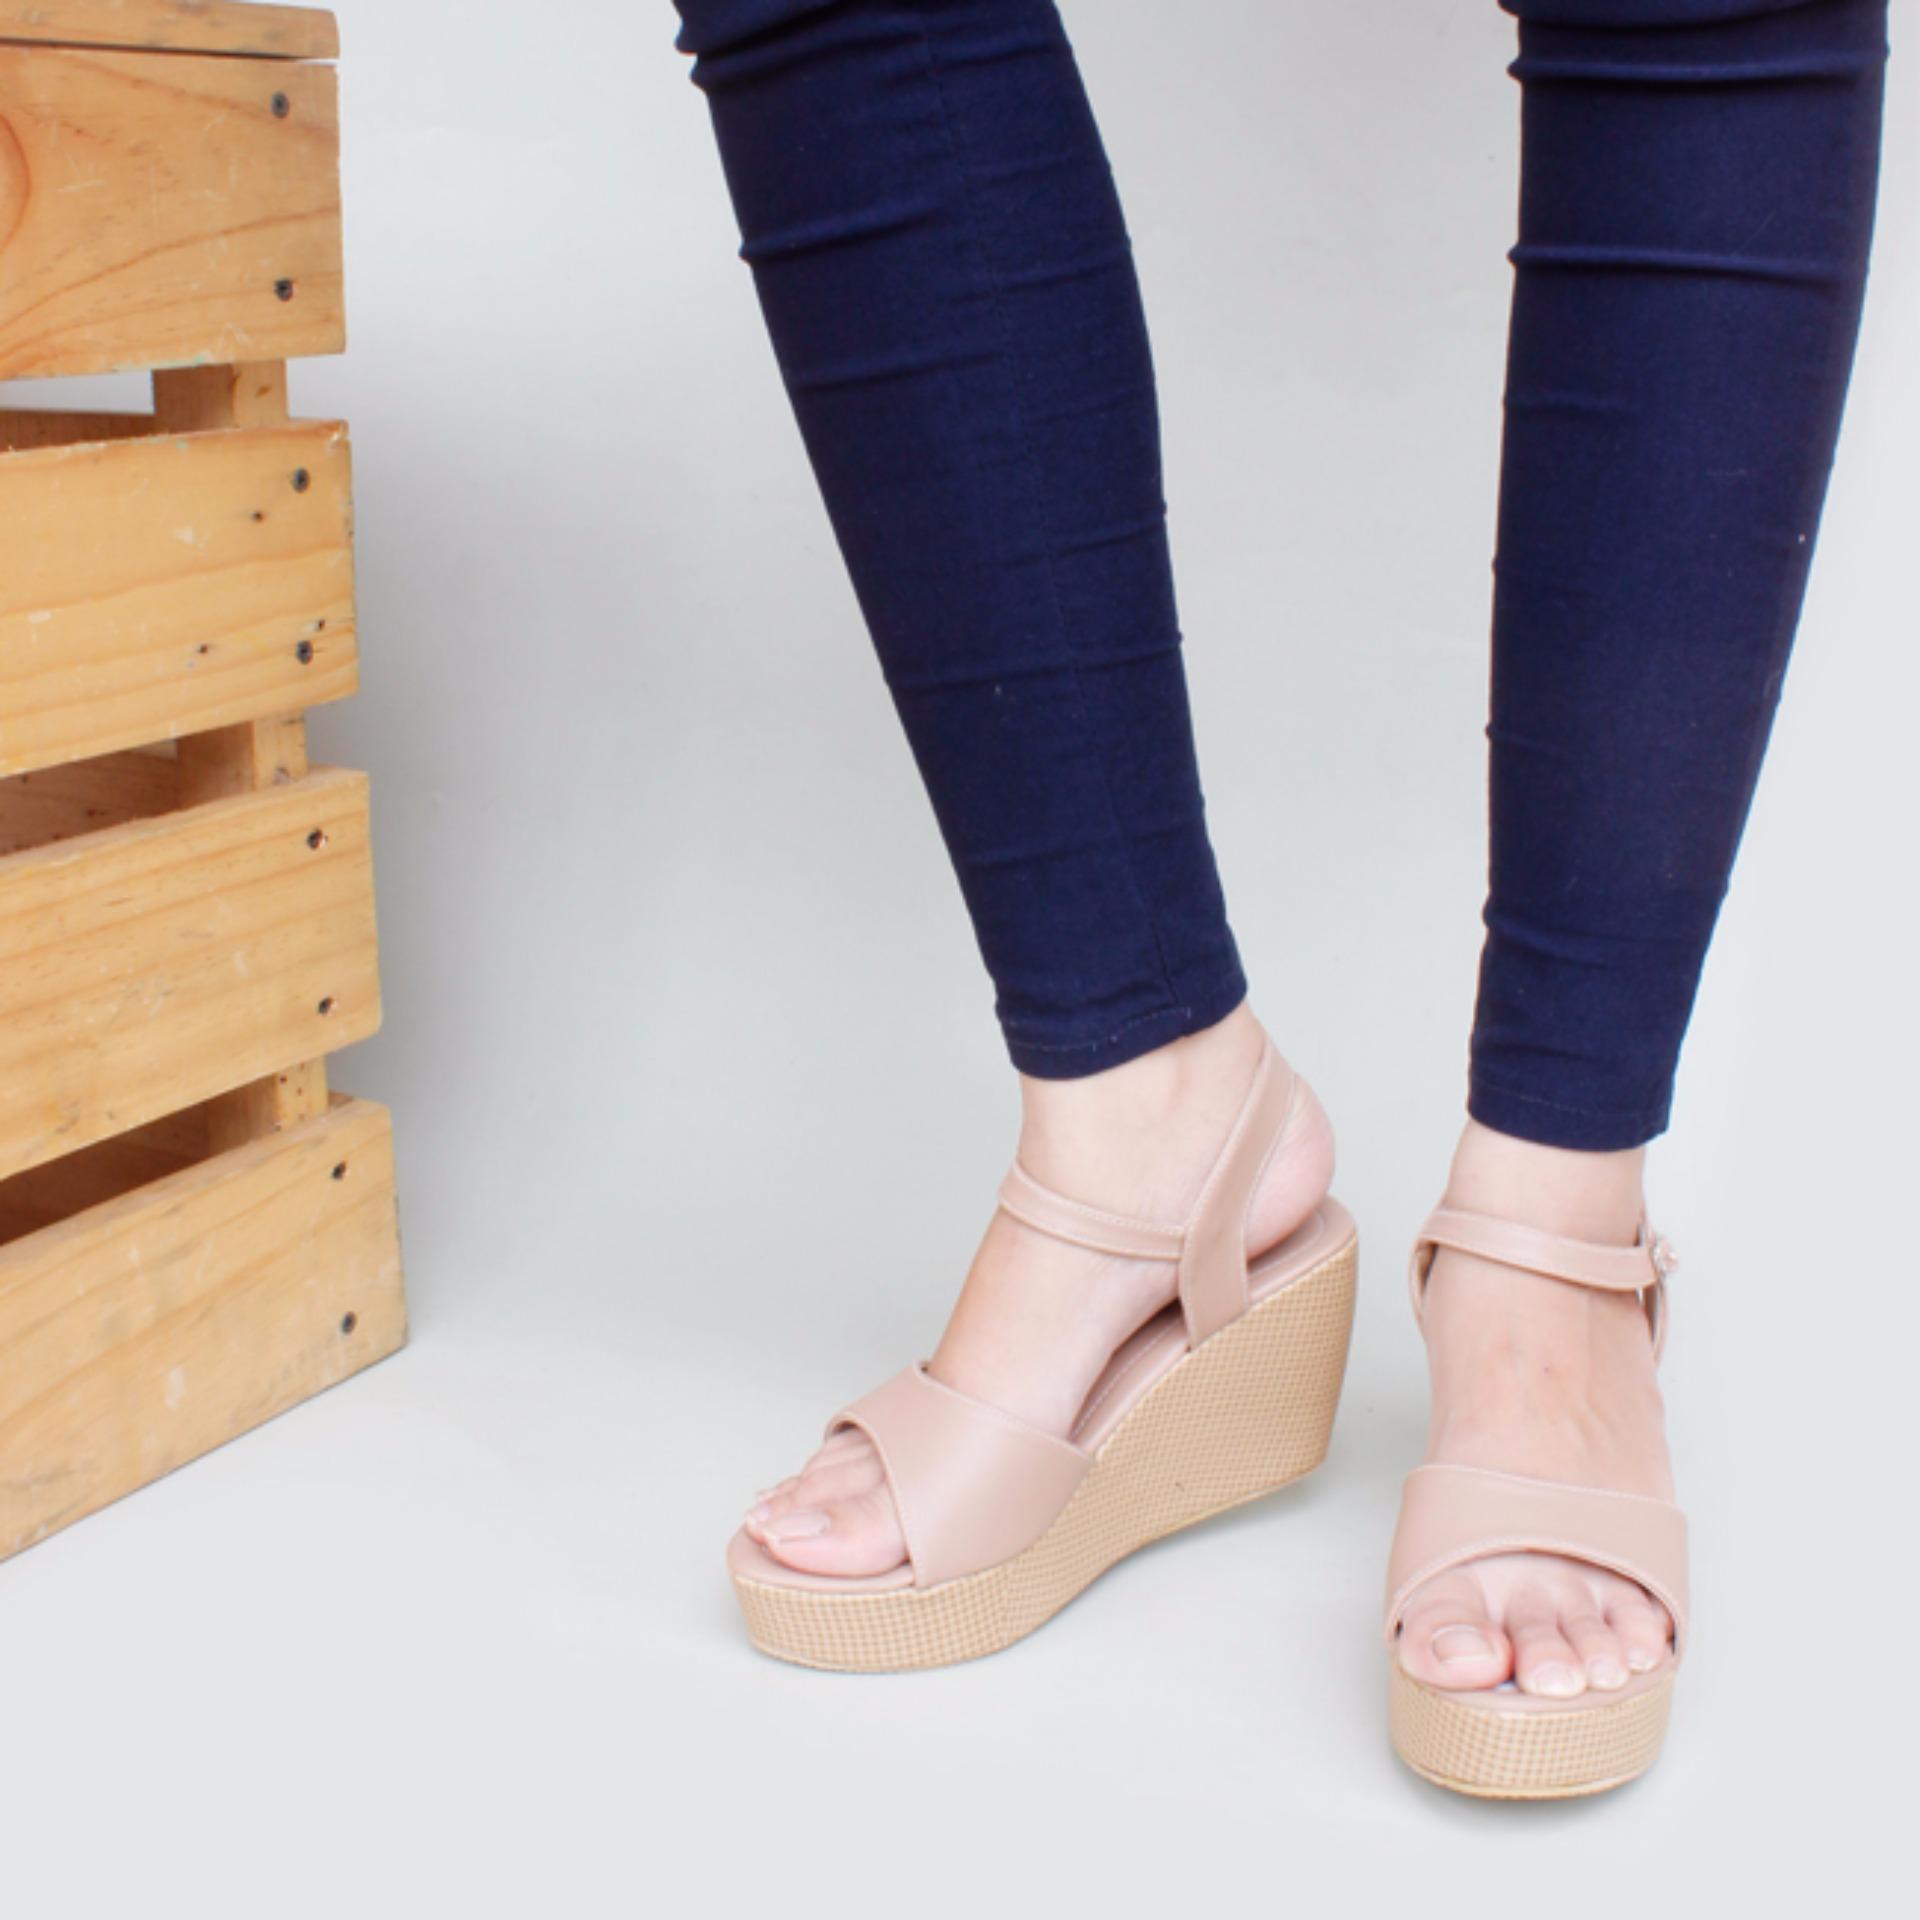 Moya Pump Shoes Toe High Heels Glitter Hitam Page 2 Daftar Sepatu Wanita Fs62 Coklat Wedges Ankle Strap Cy07 Mocca